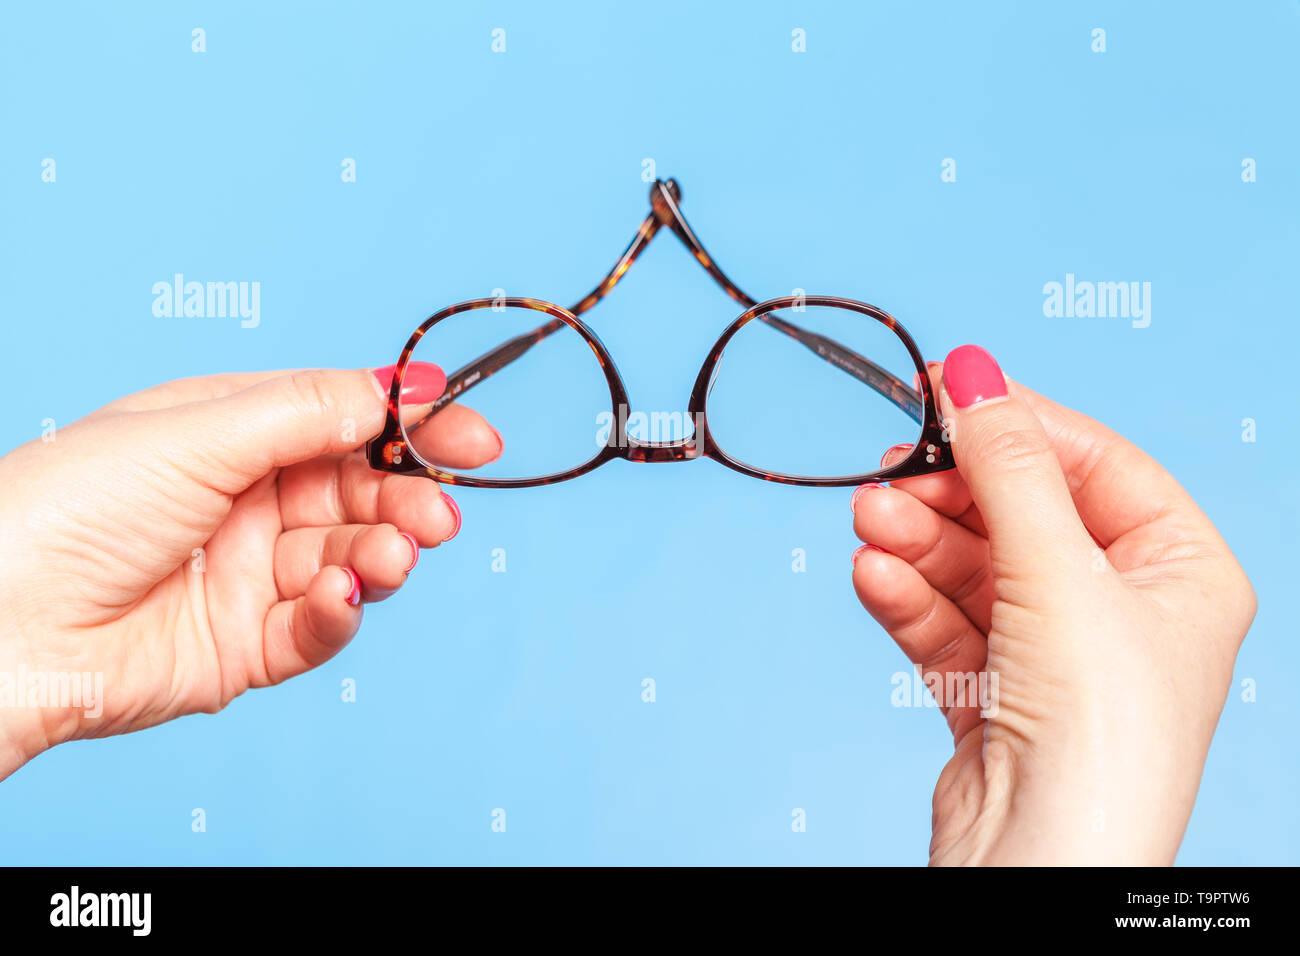 ptometrist giving new optical glasses - Stock Image